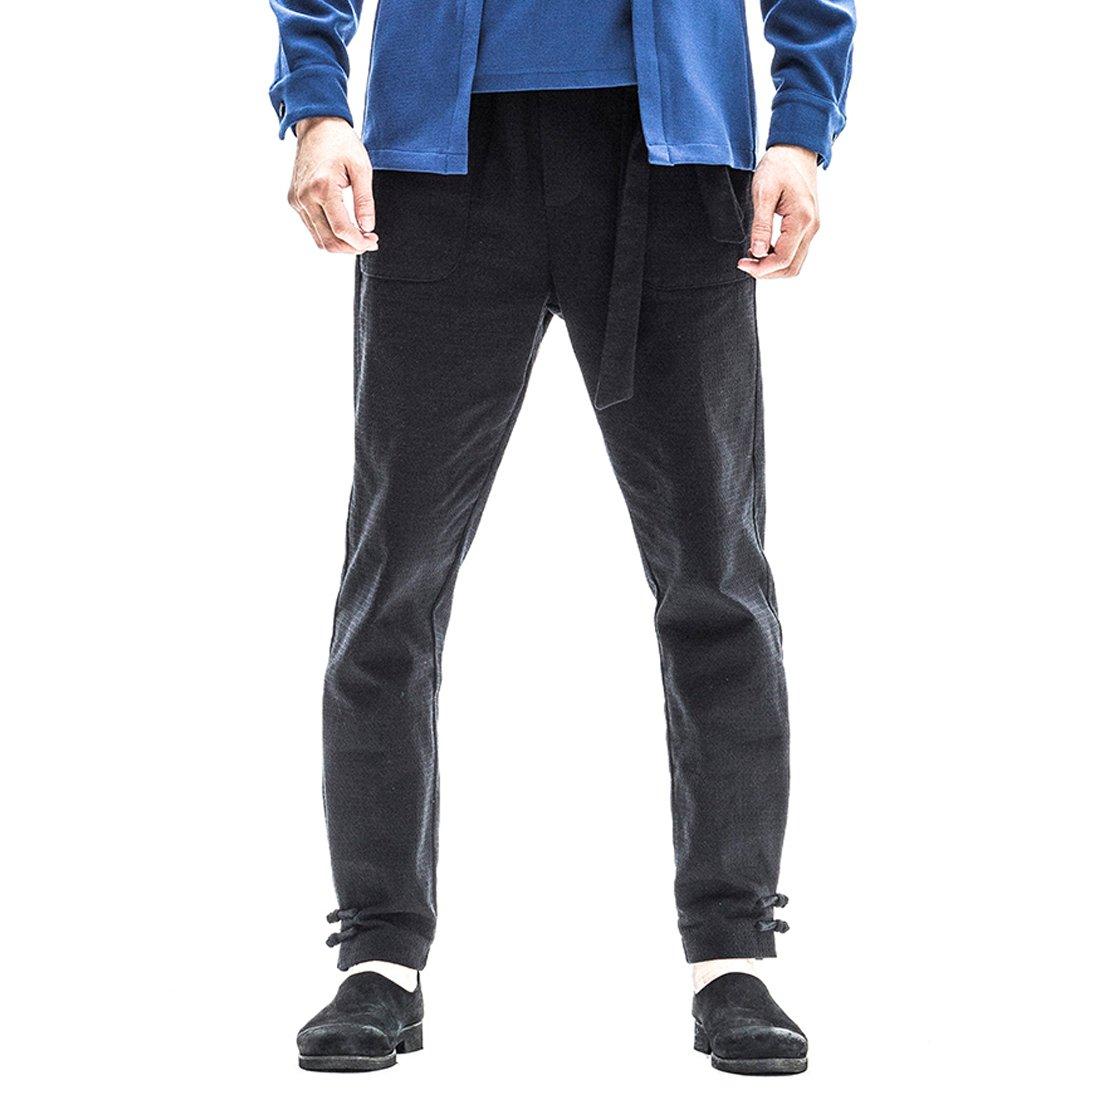 Kung Fu Smith Vintage Tai Chi Casual Cotton Pocket Frog Button Trouser Pants, Black XL